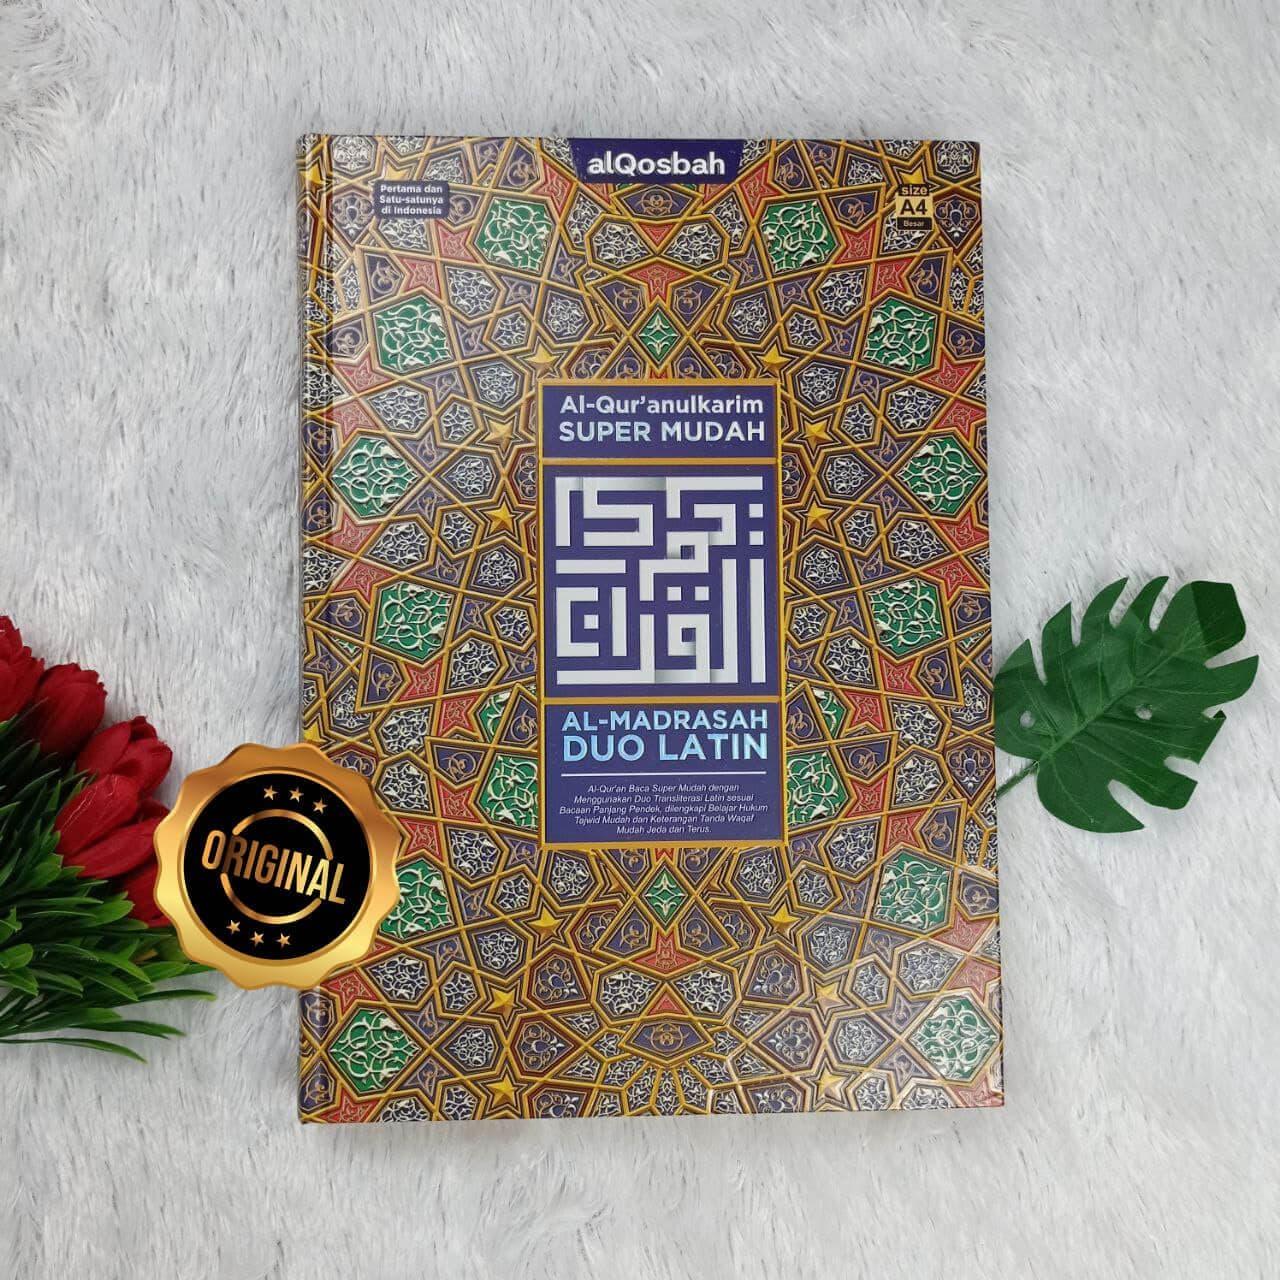 Al-Qur'an Super Mudah Al-Madrasah Duo Latin Ukuran A4